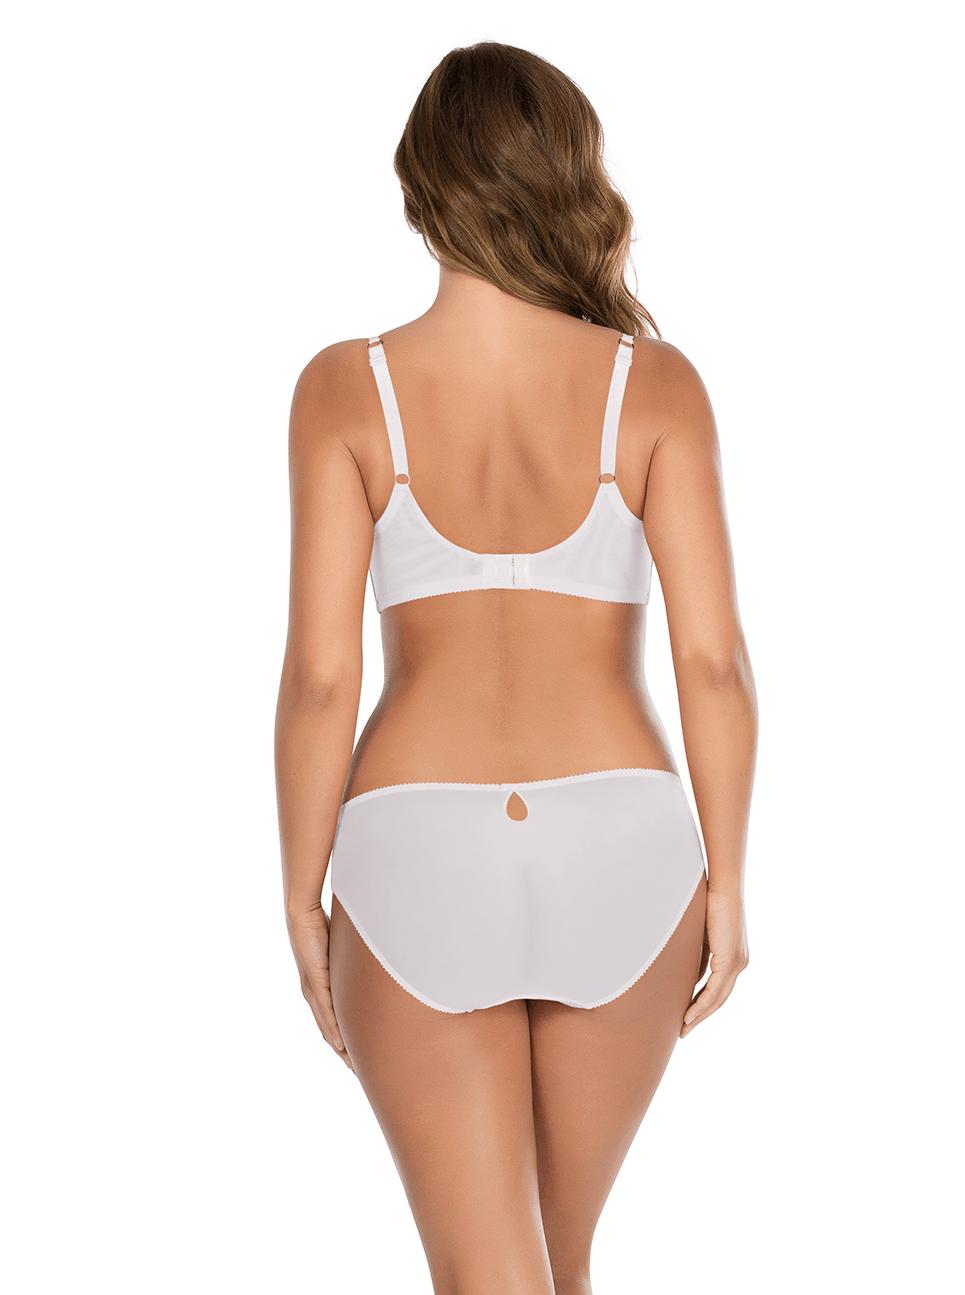 Irene UnlinedWireBraP5332 BikiniP5333 Ivory Back - Irene Bikini - Ivory - P5333